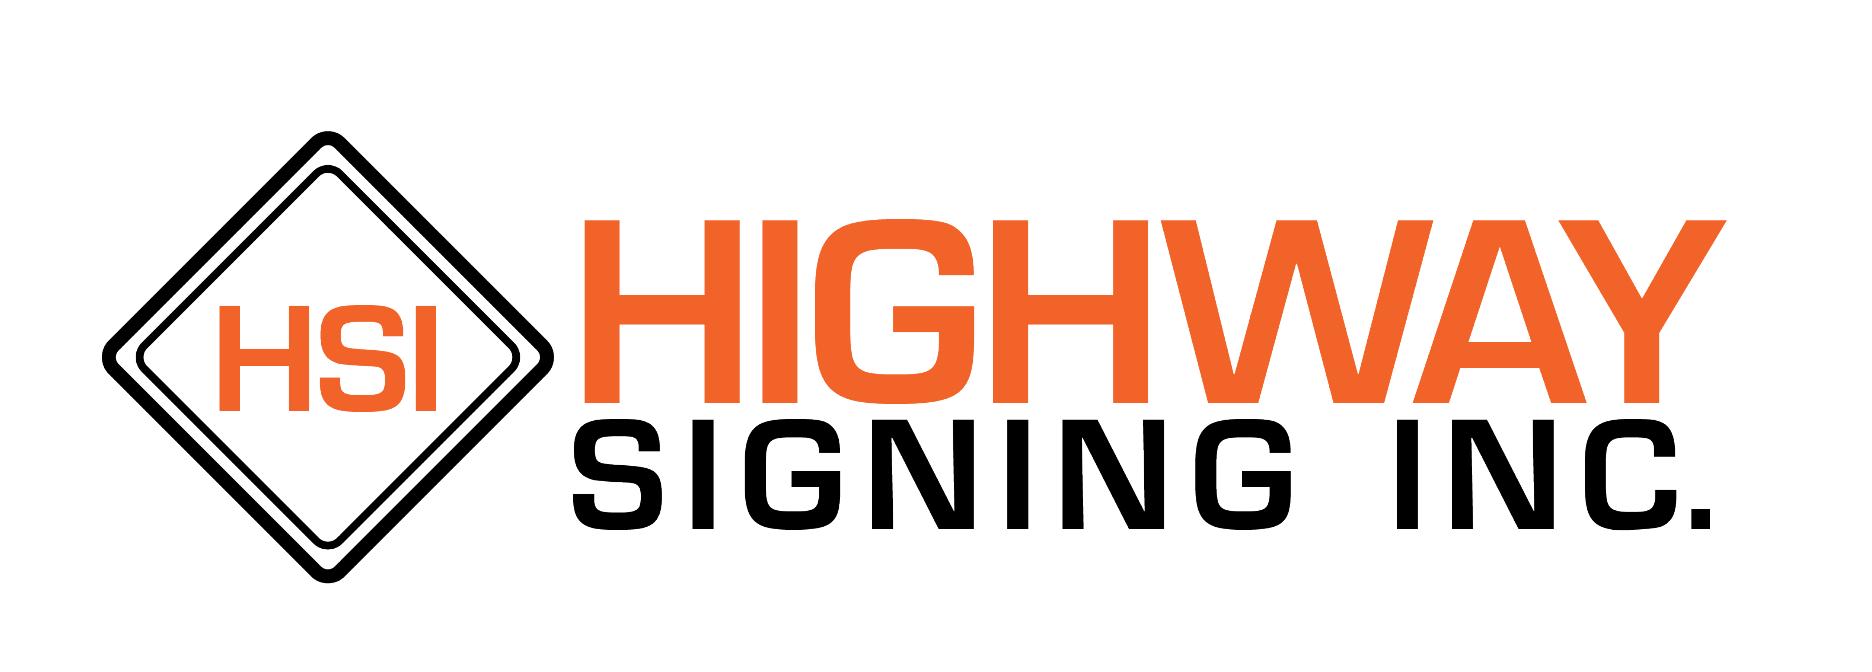 Highway Signing, Inc. Company Logo